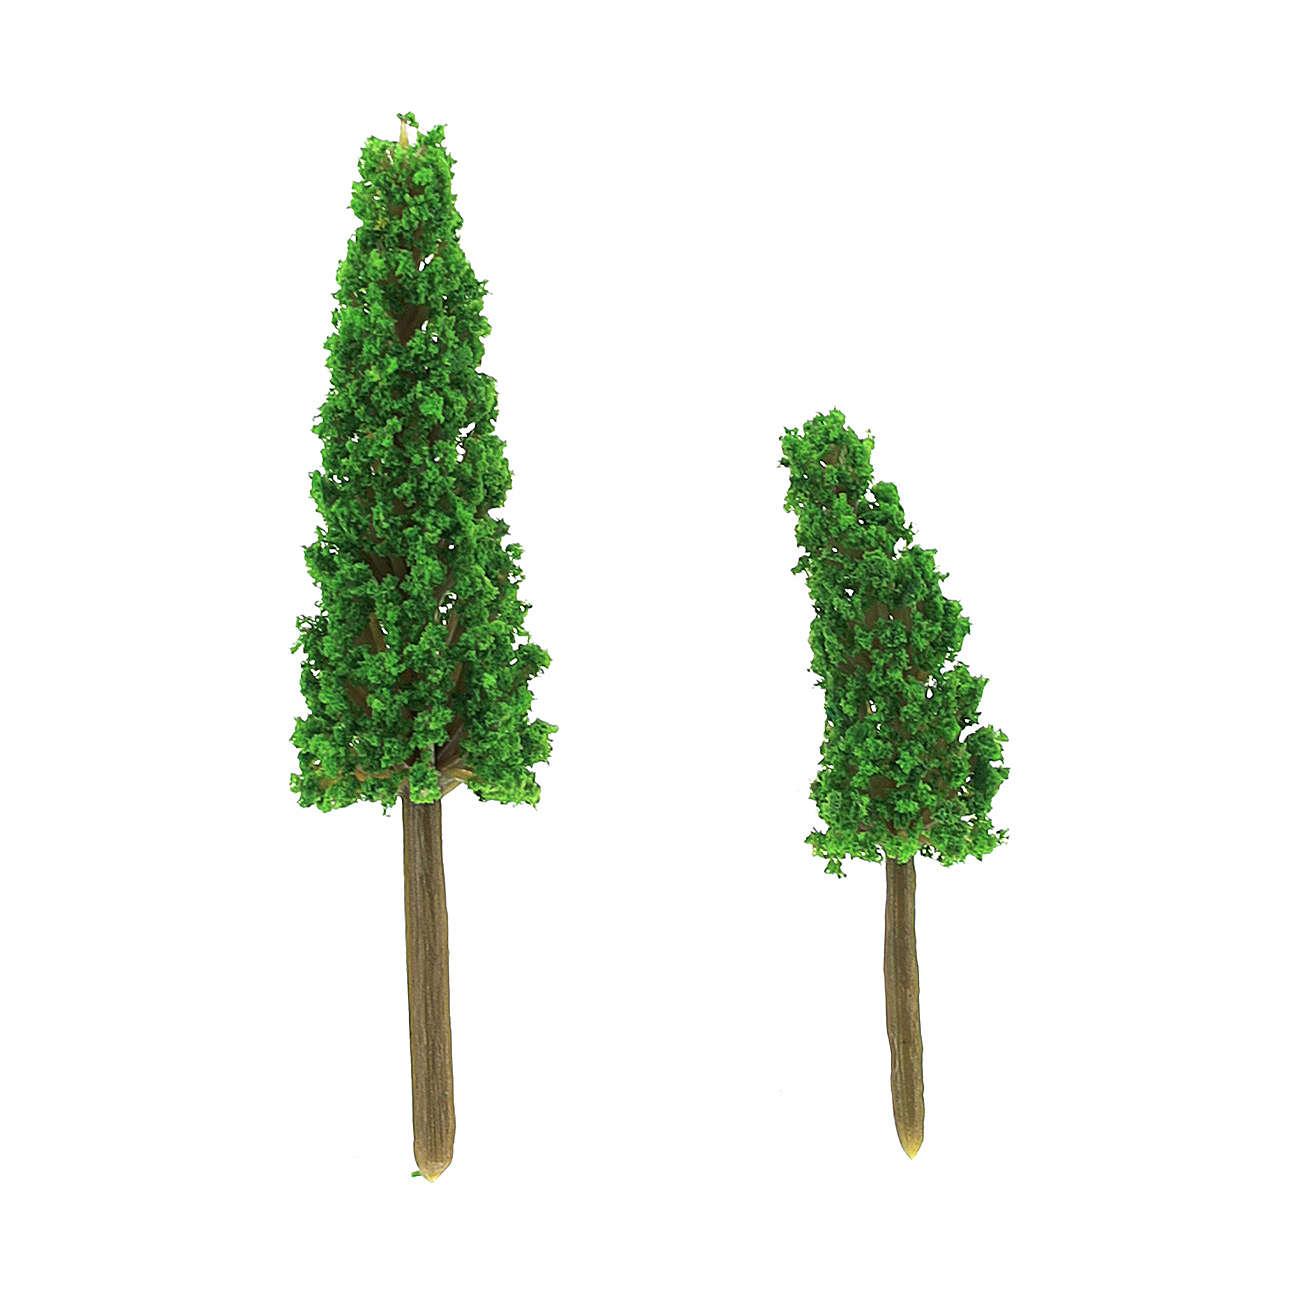 Conjunto 2 ciprestes para bricolagem presépio altura real 6-9 cm 4